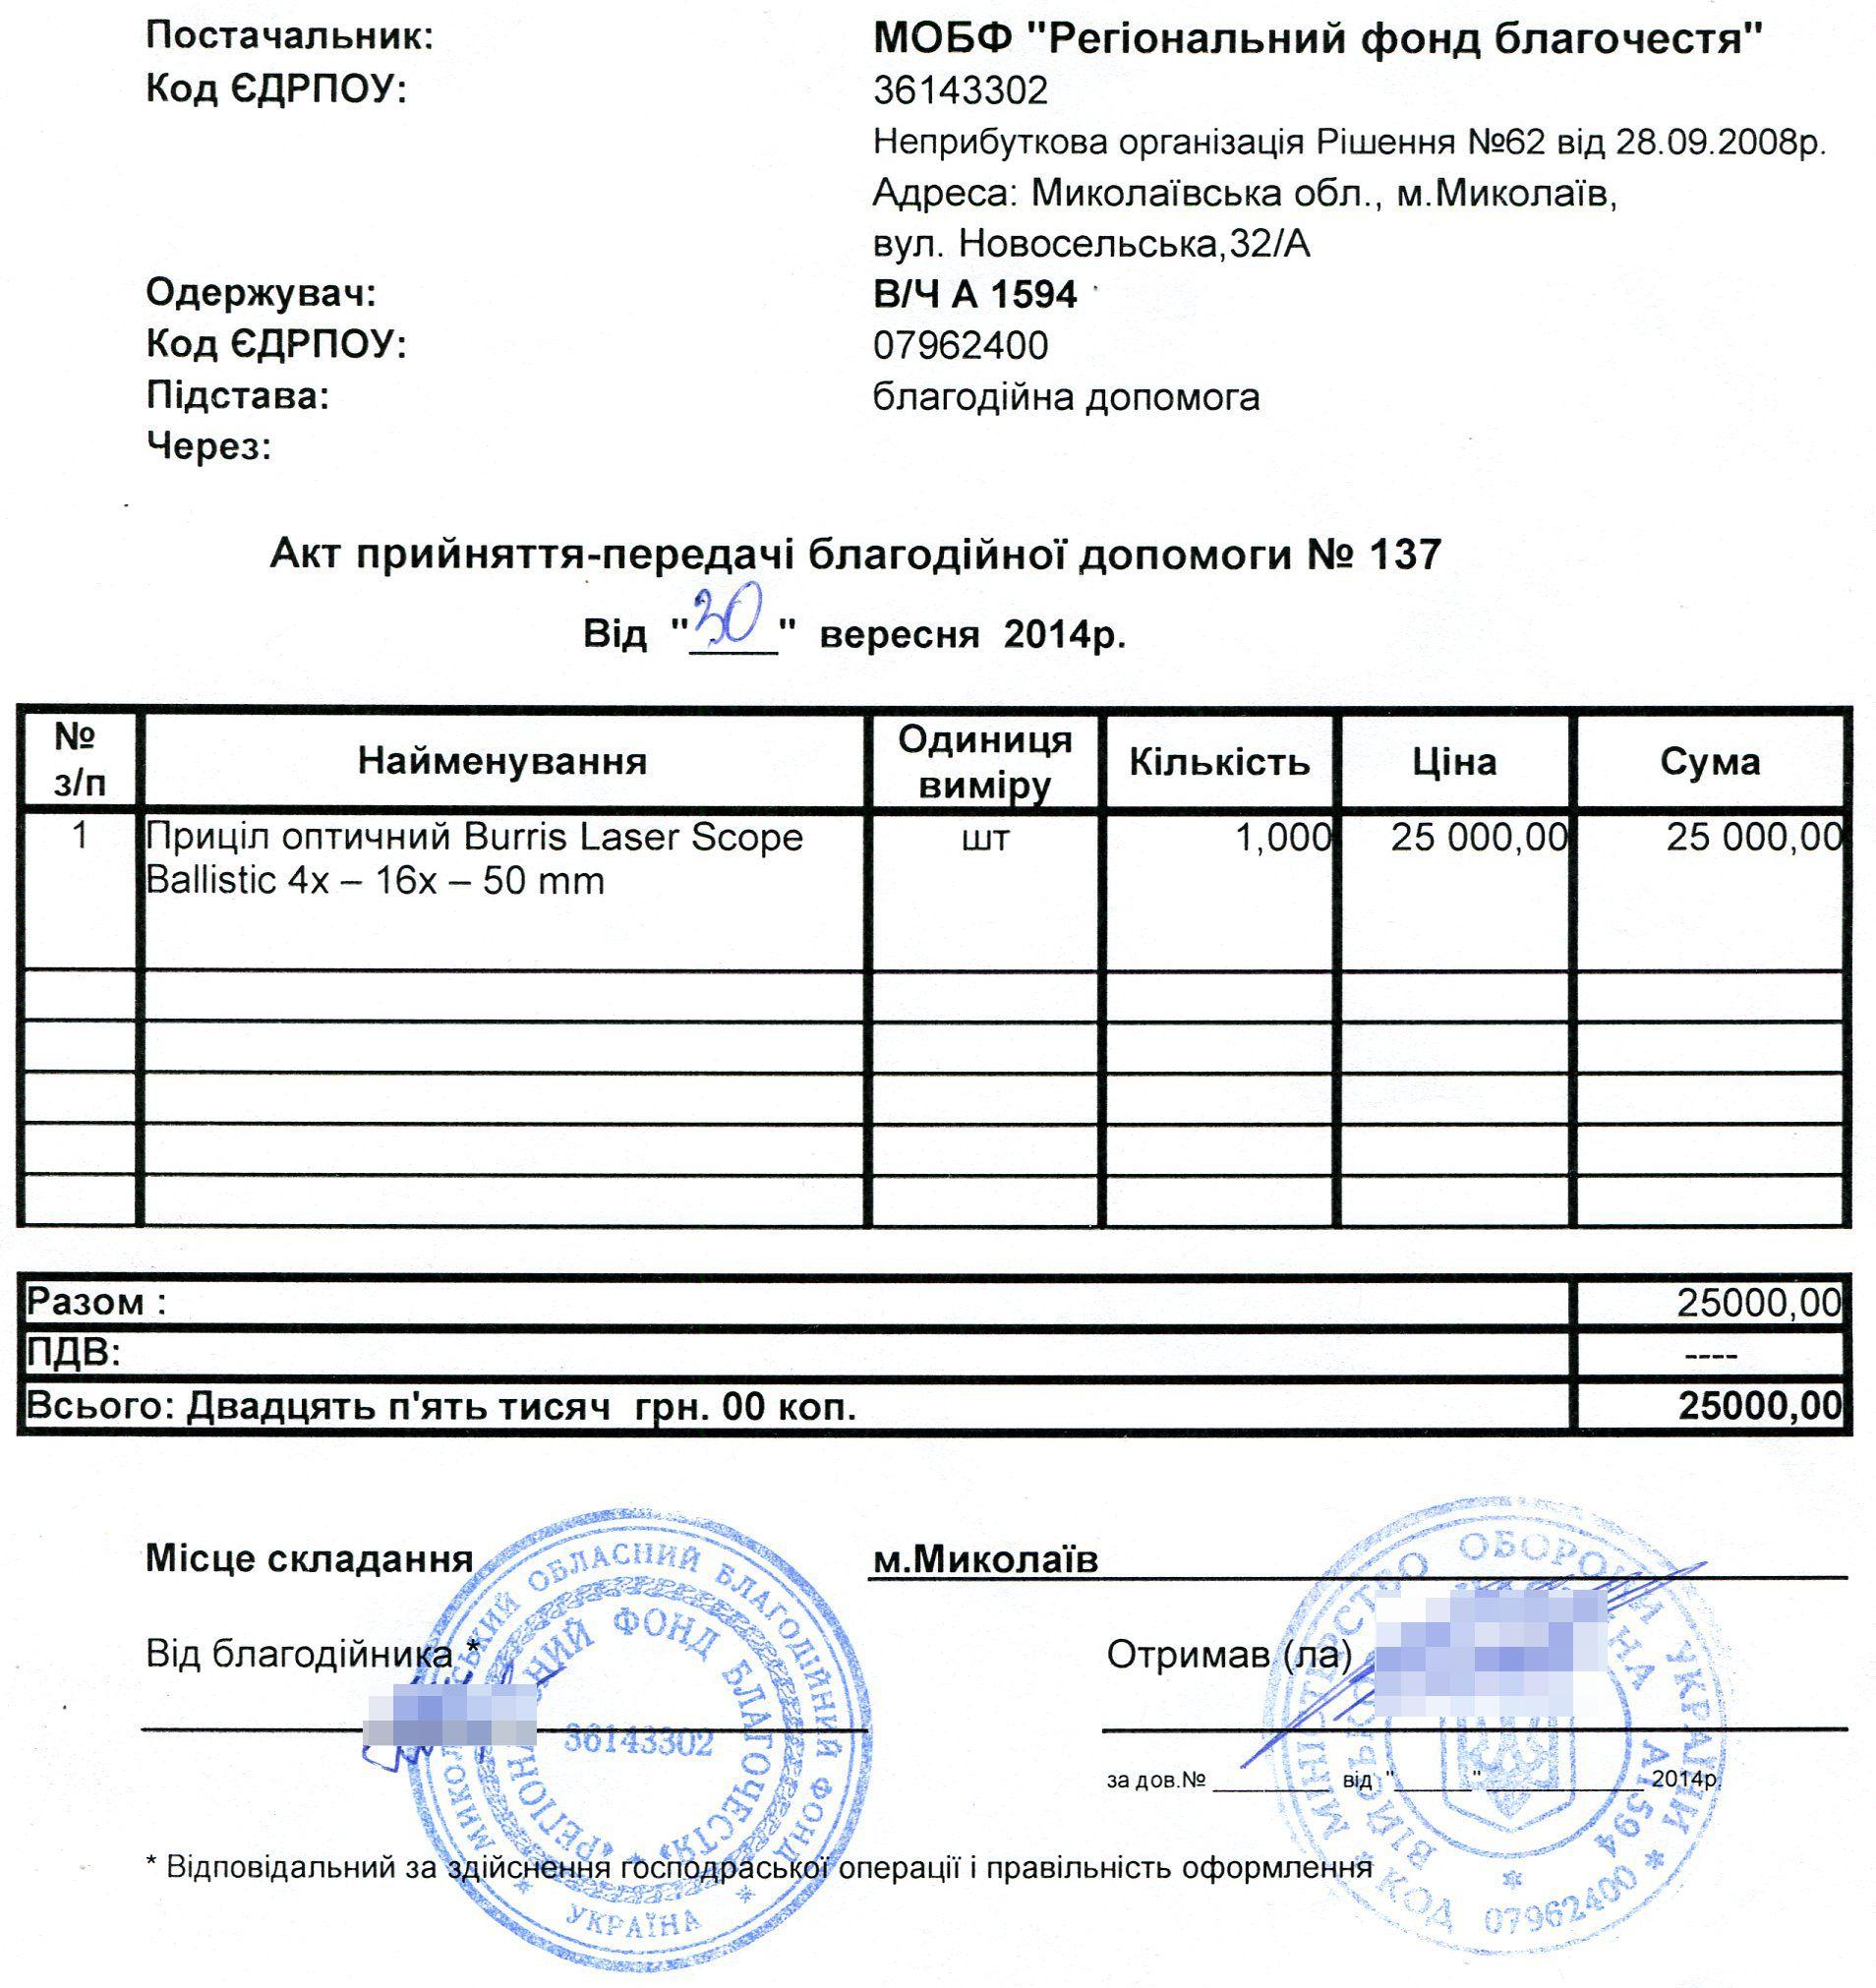 Akt-priema-peredachi-fond-opticheskij-pricel-Burris